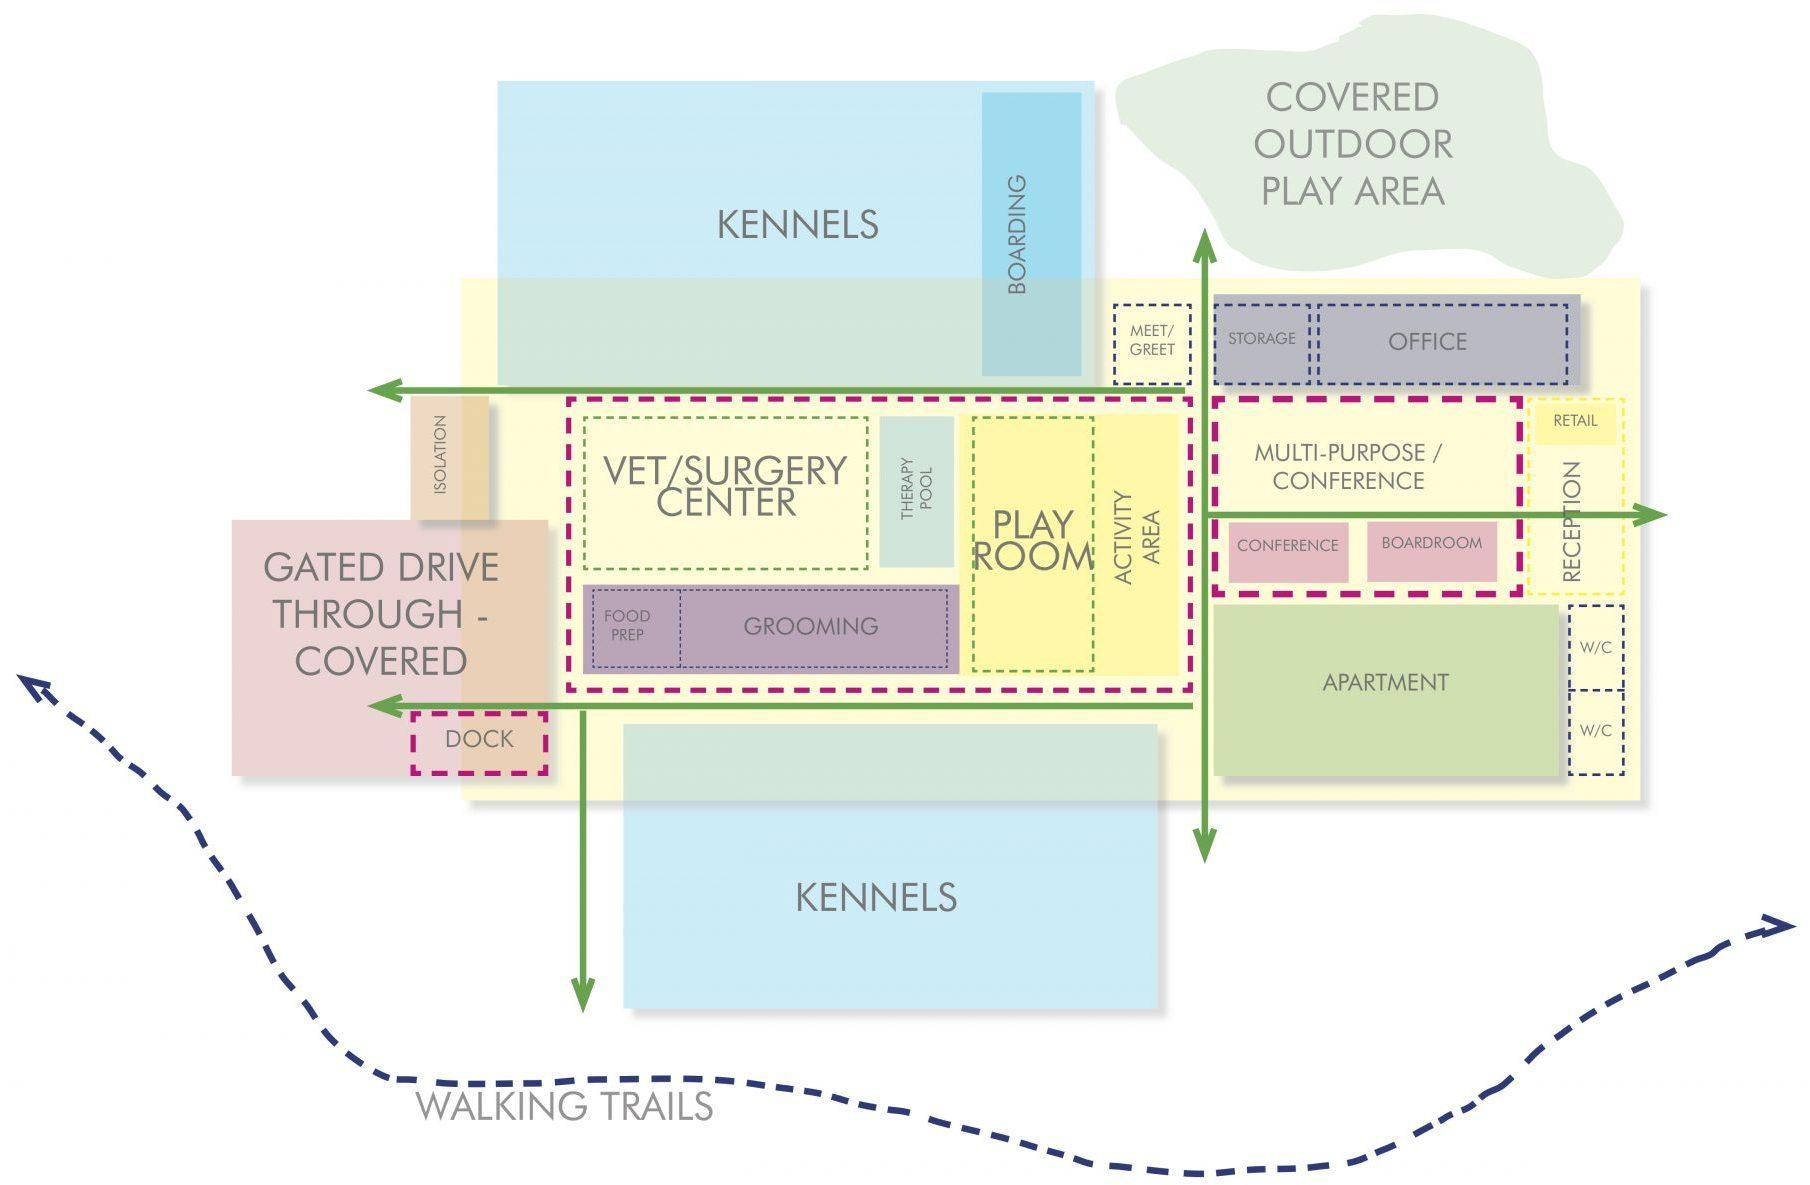 fttf-shelter-bubble-diagram